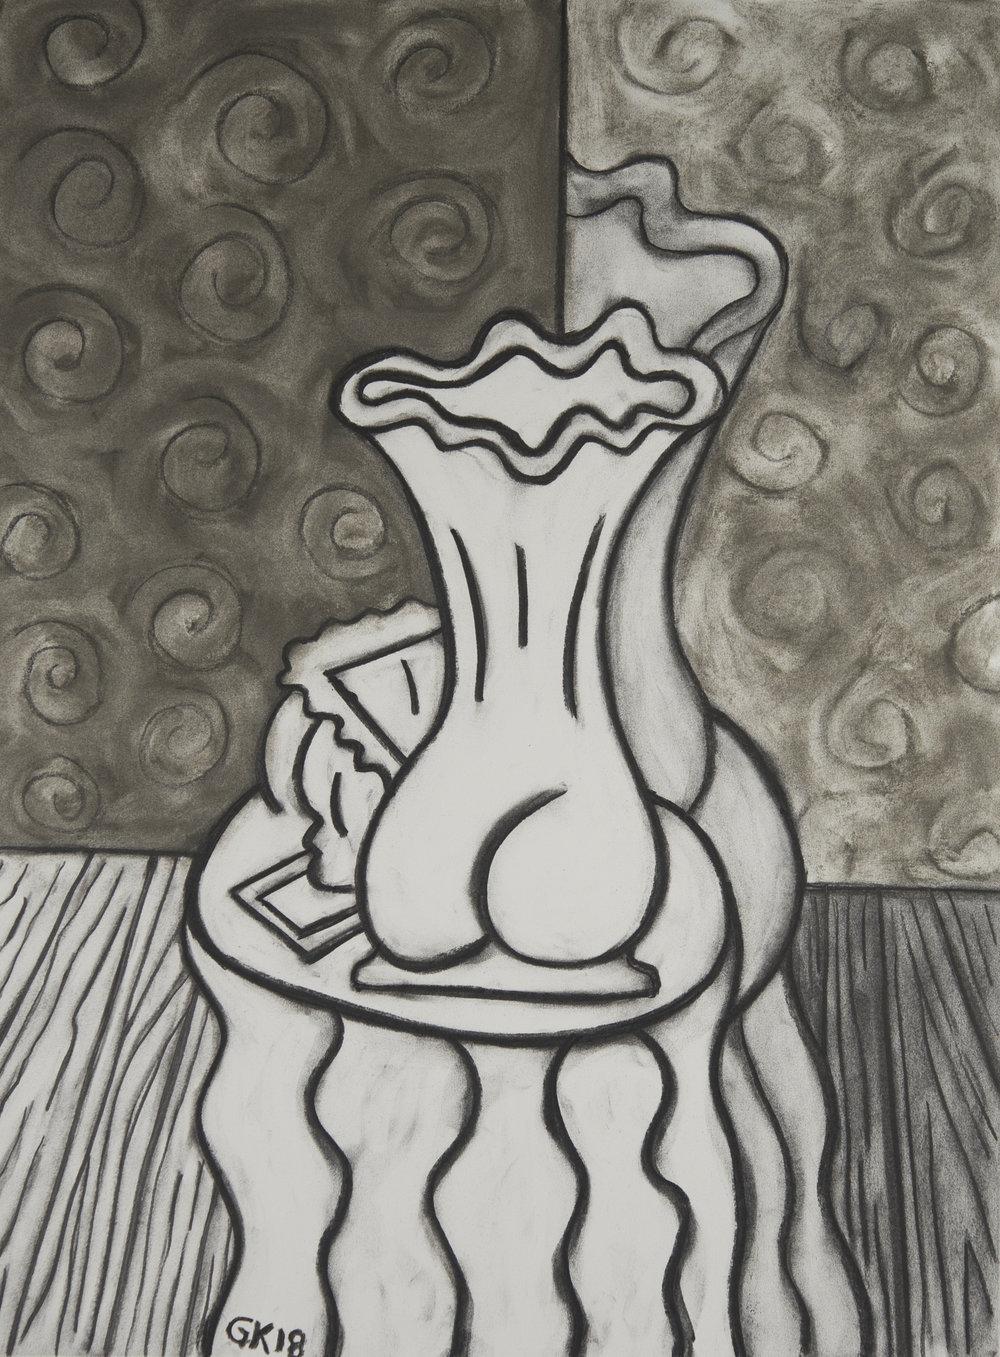 Monochrome Colletive : Gary Kret : Tokarski Series #6 : Derwent colored charcoal on Reeves BFK : 30 x 22 in. : $2,400.jpg